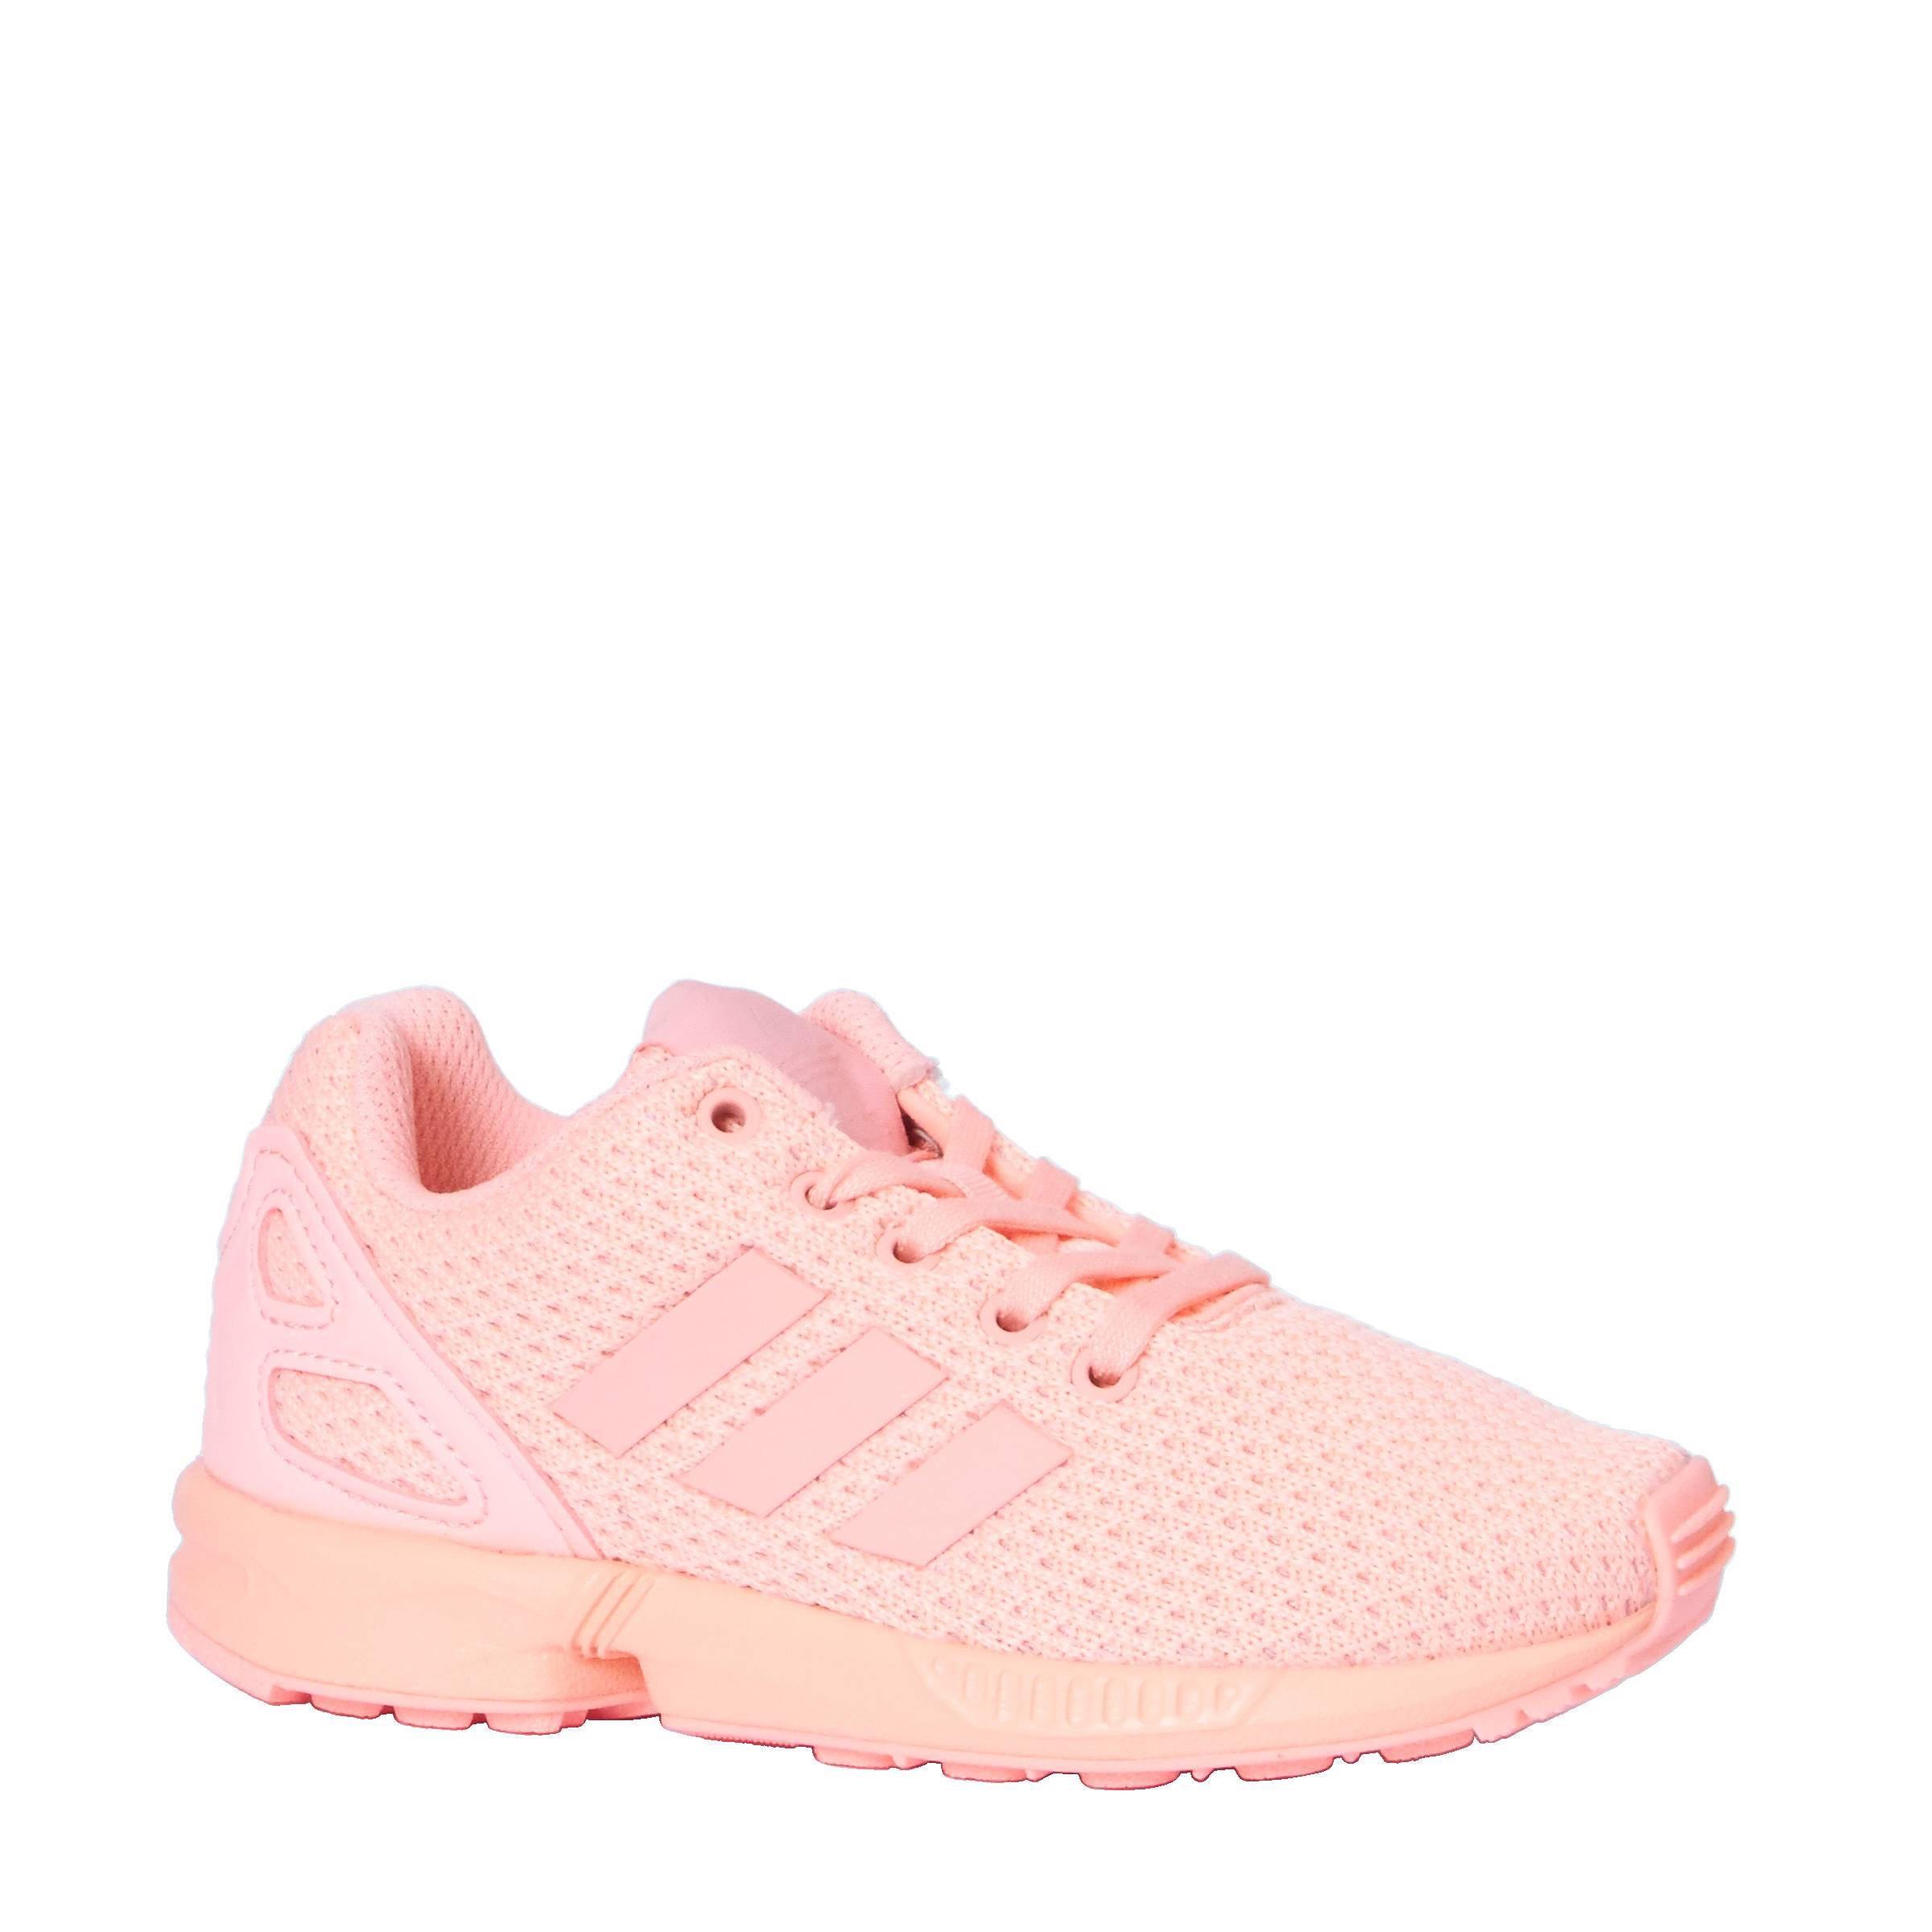 adidas originals zx flux roze